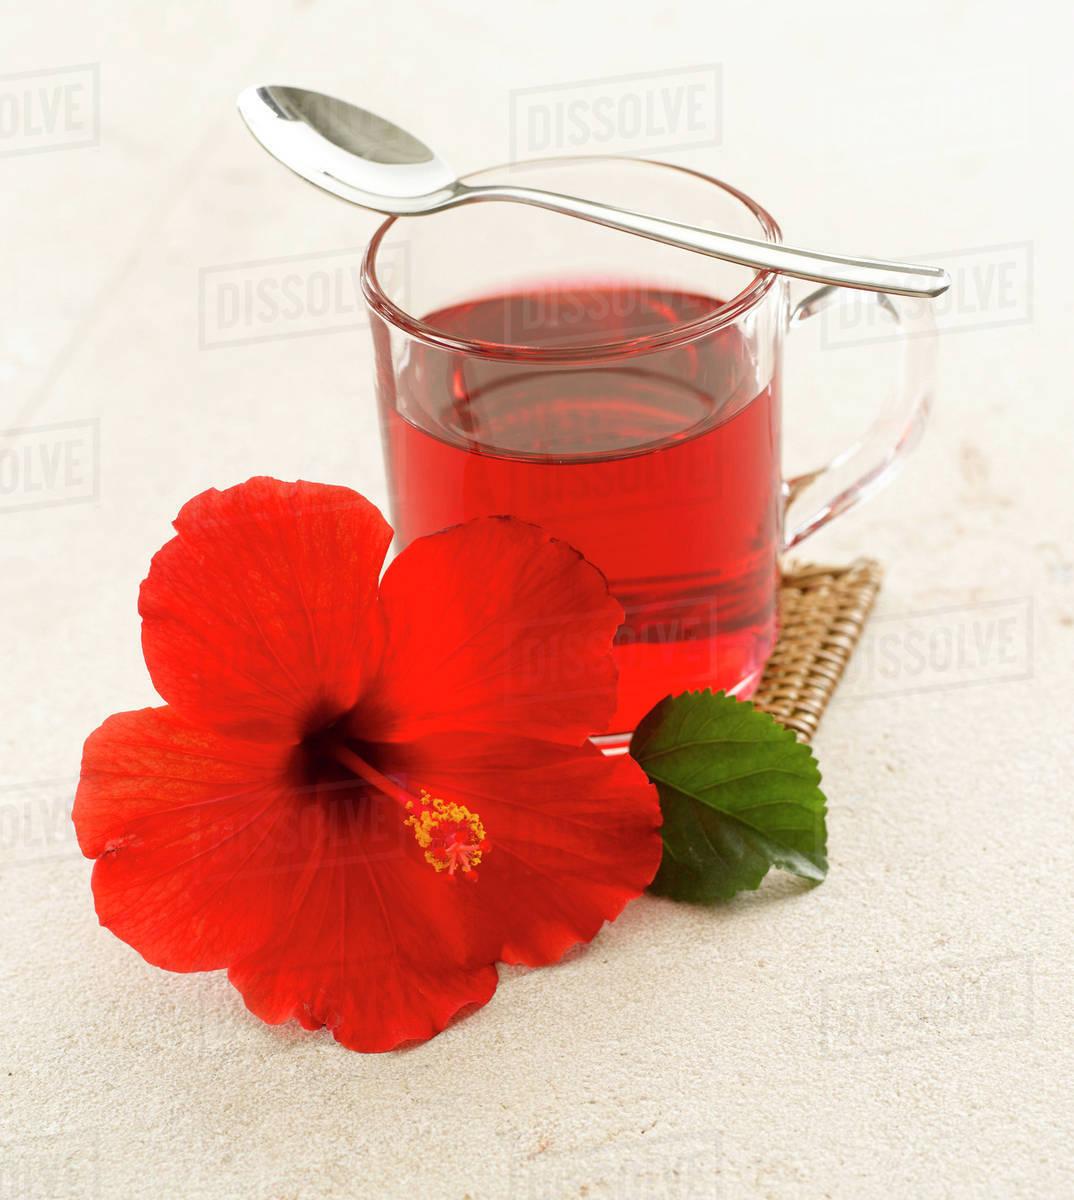 Hibiscus Flower Tea And Hibiscus Blossom Stock Photo